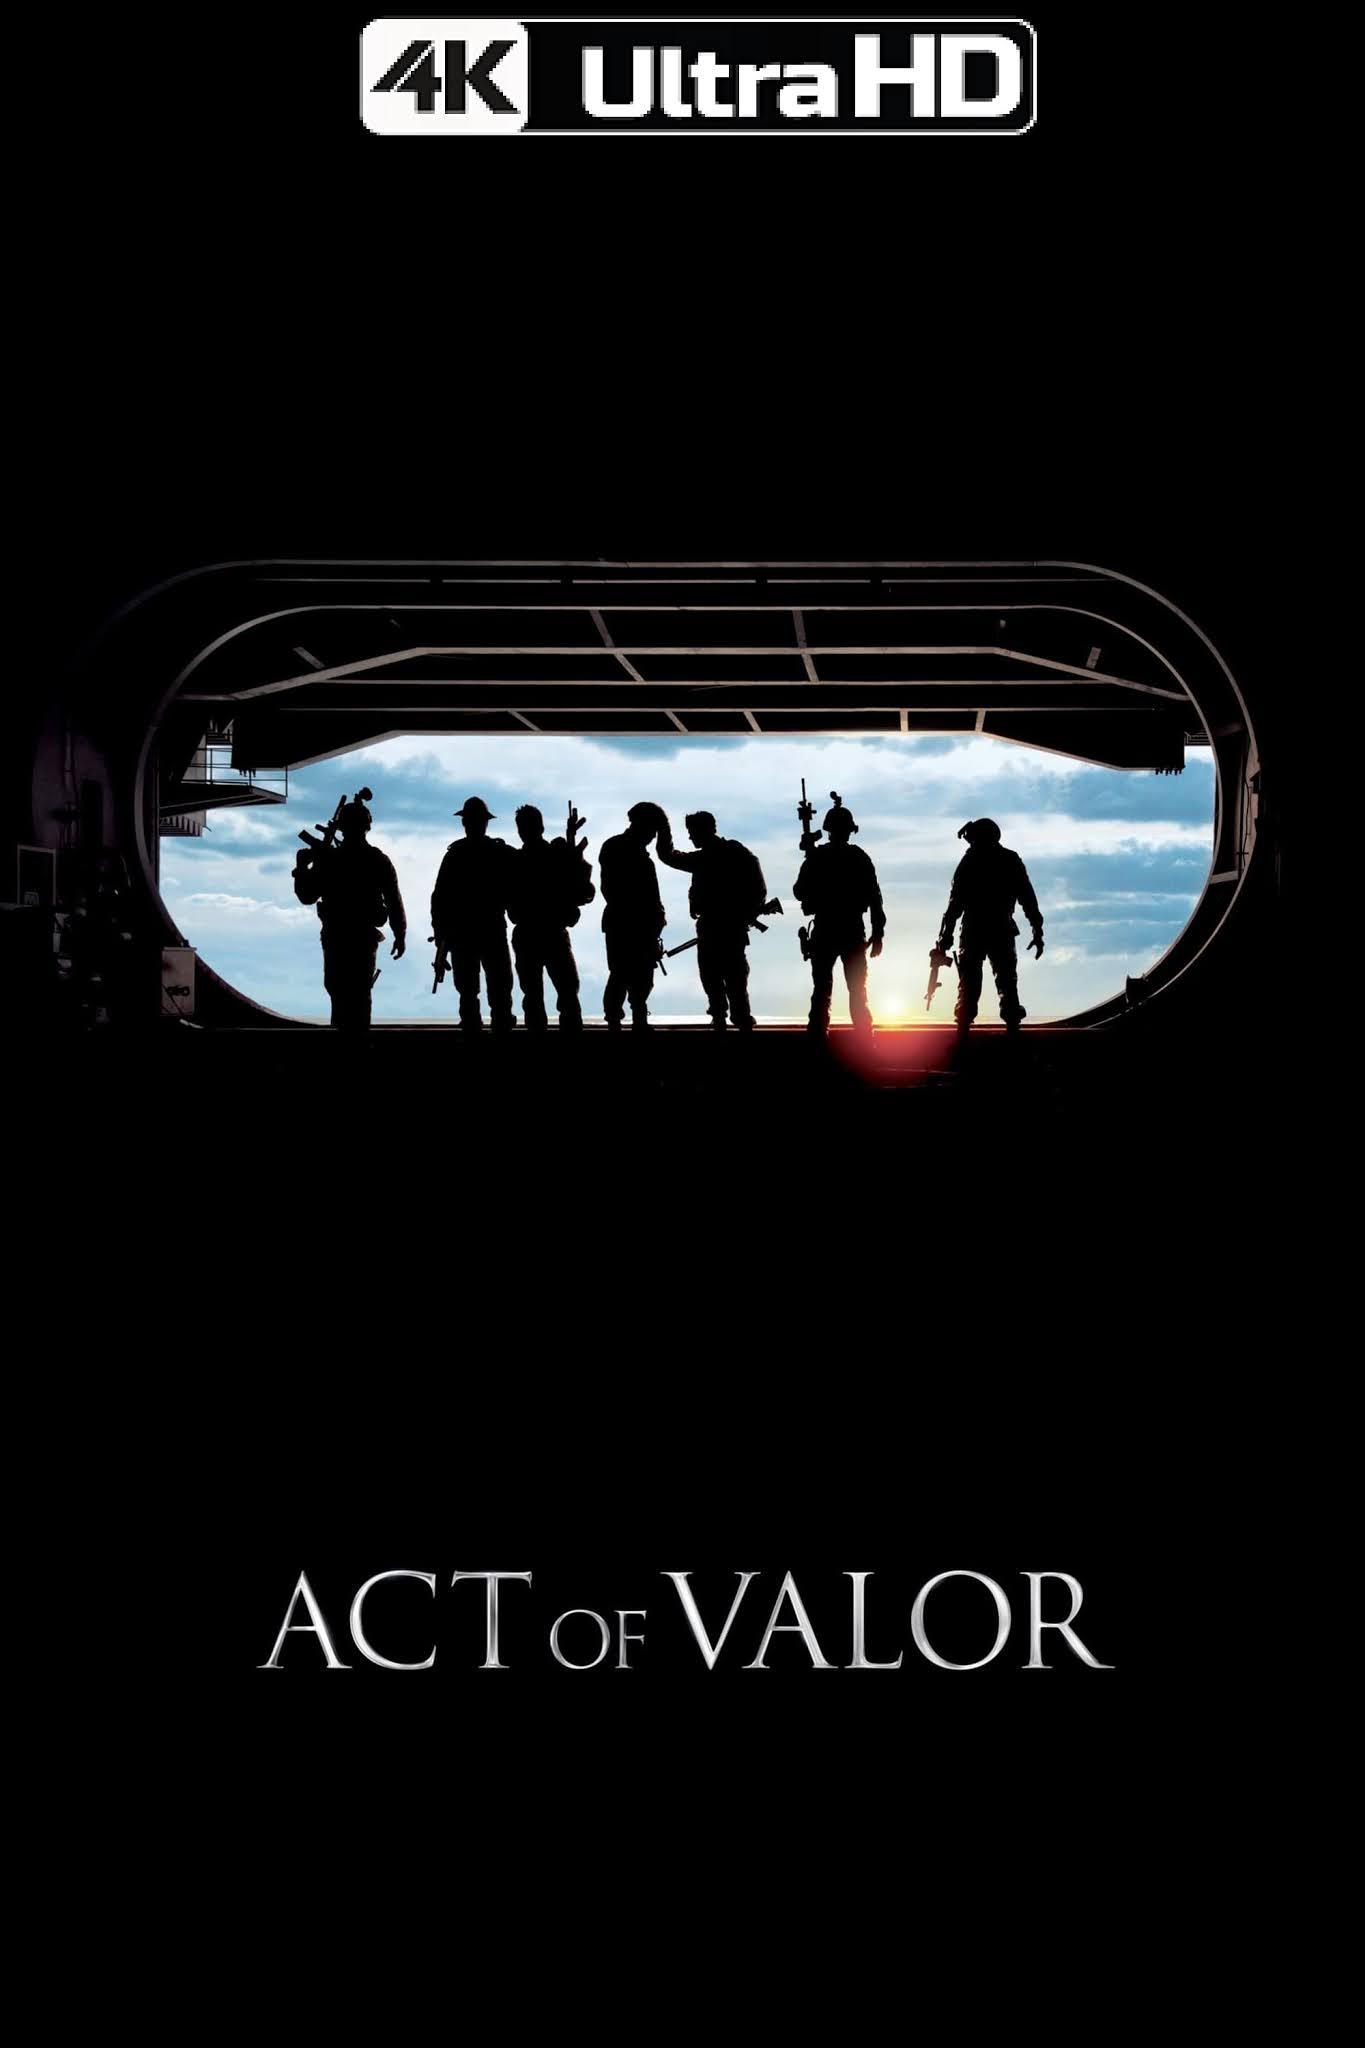 Act of Valor (2012) WEB-DL 4K SDR Latino – CMHDD